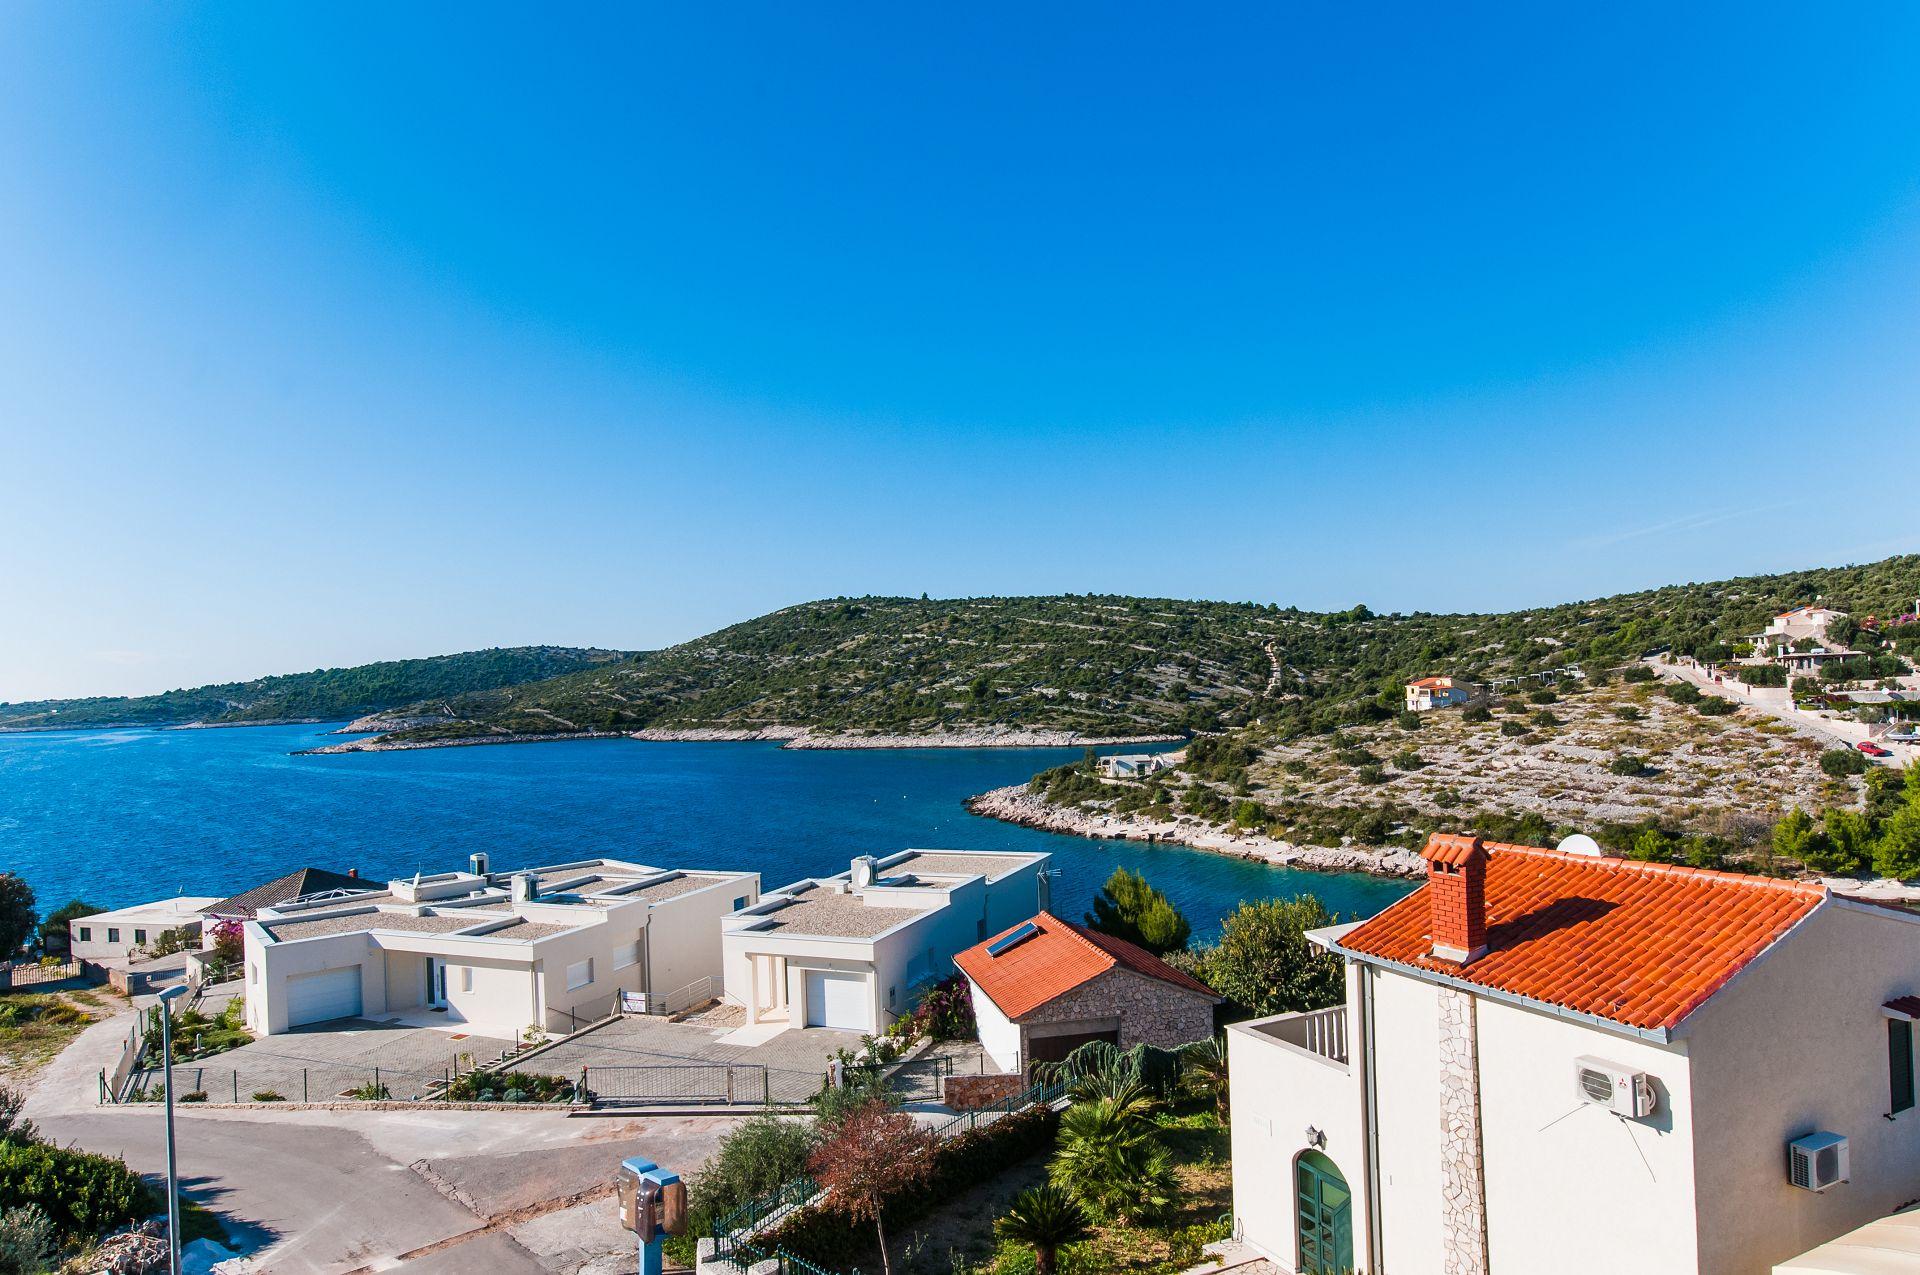 Ferienwohnung 01106ROGO A2(6+2) - Bucht Kanica (Rogoznica) (741933), Rogoznica, , Dalmatien, Kroatien, Bild 4